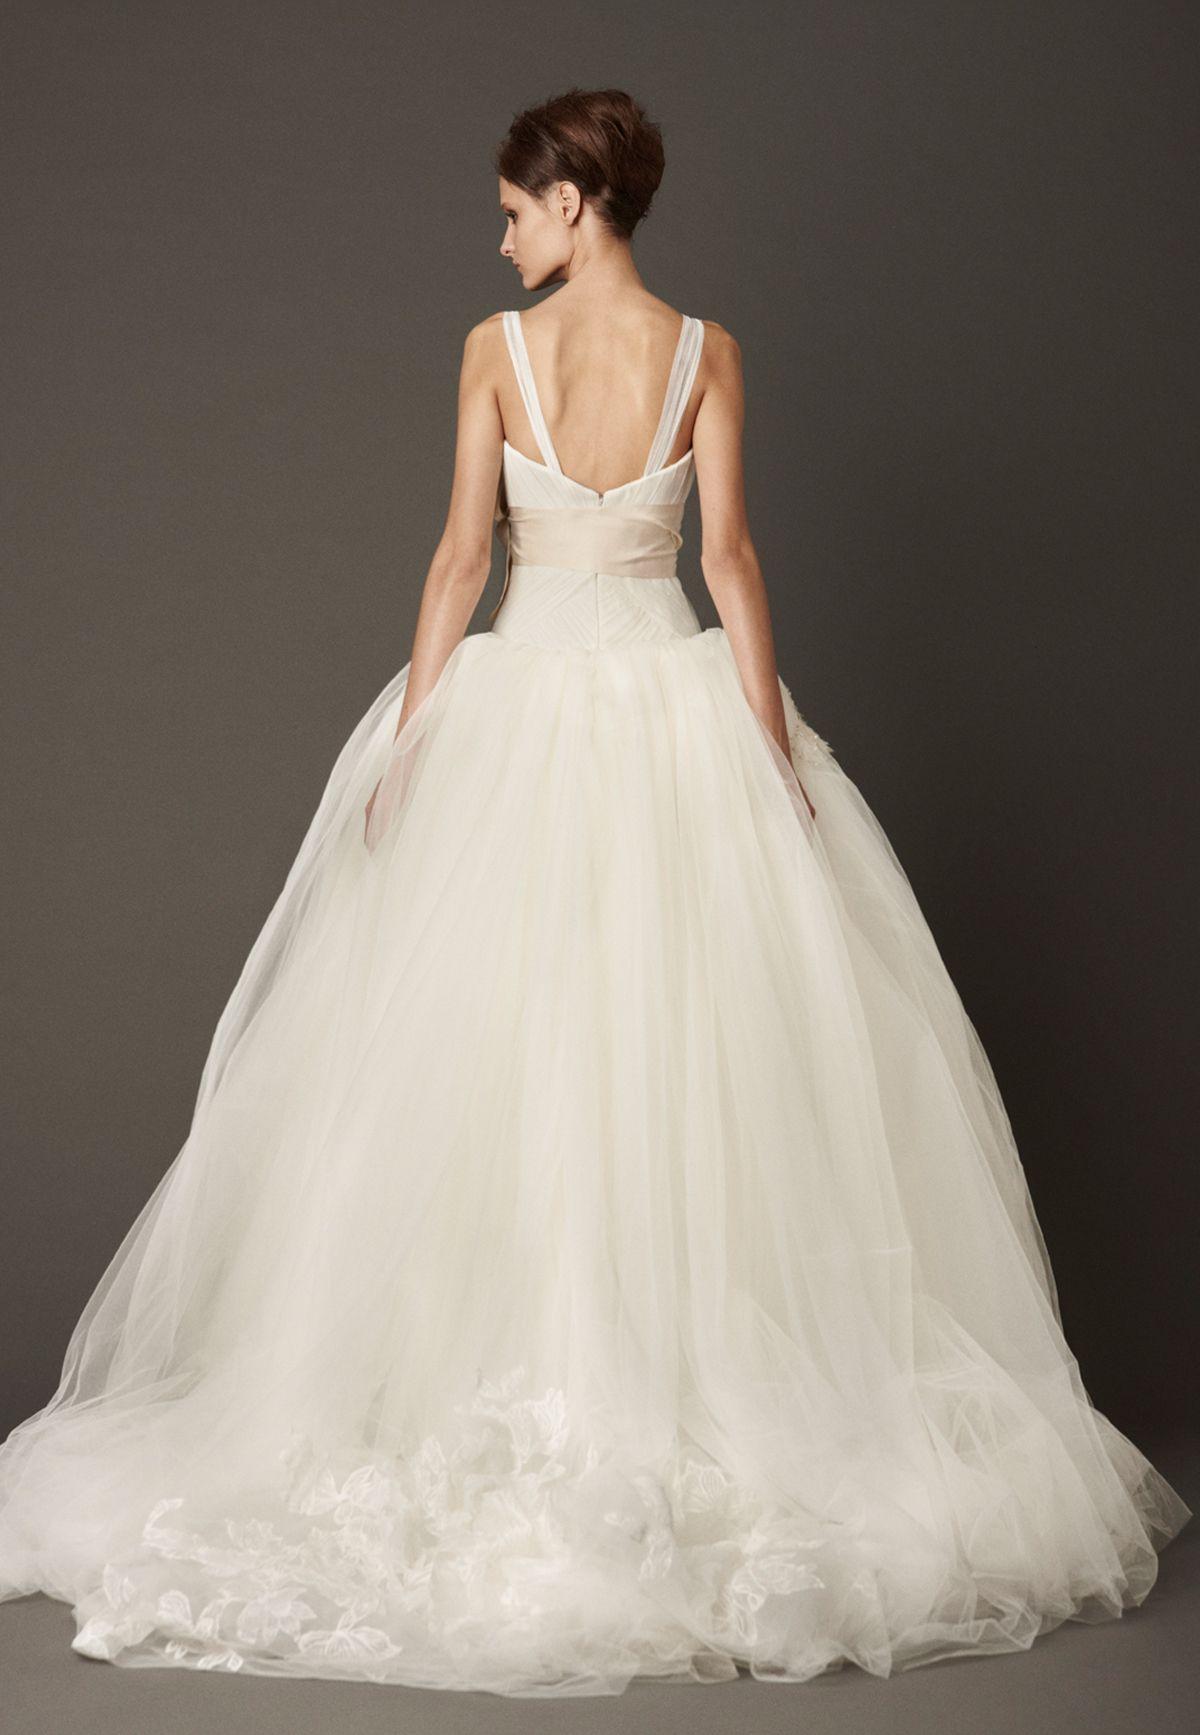 Wedding dresses bridal gowns by vera wang fall dress